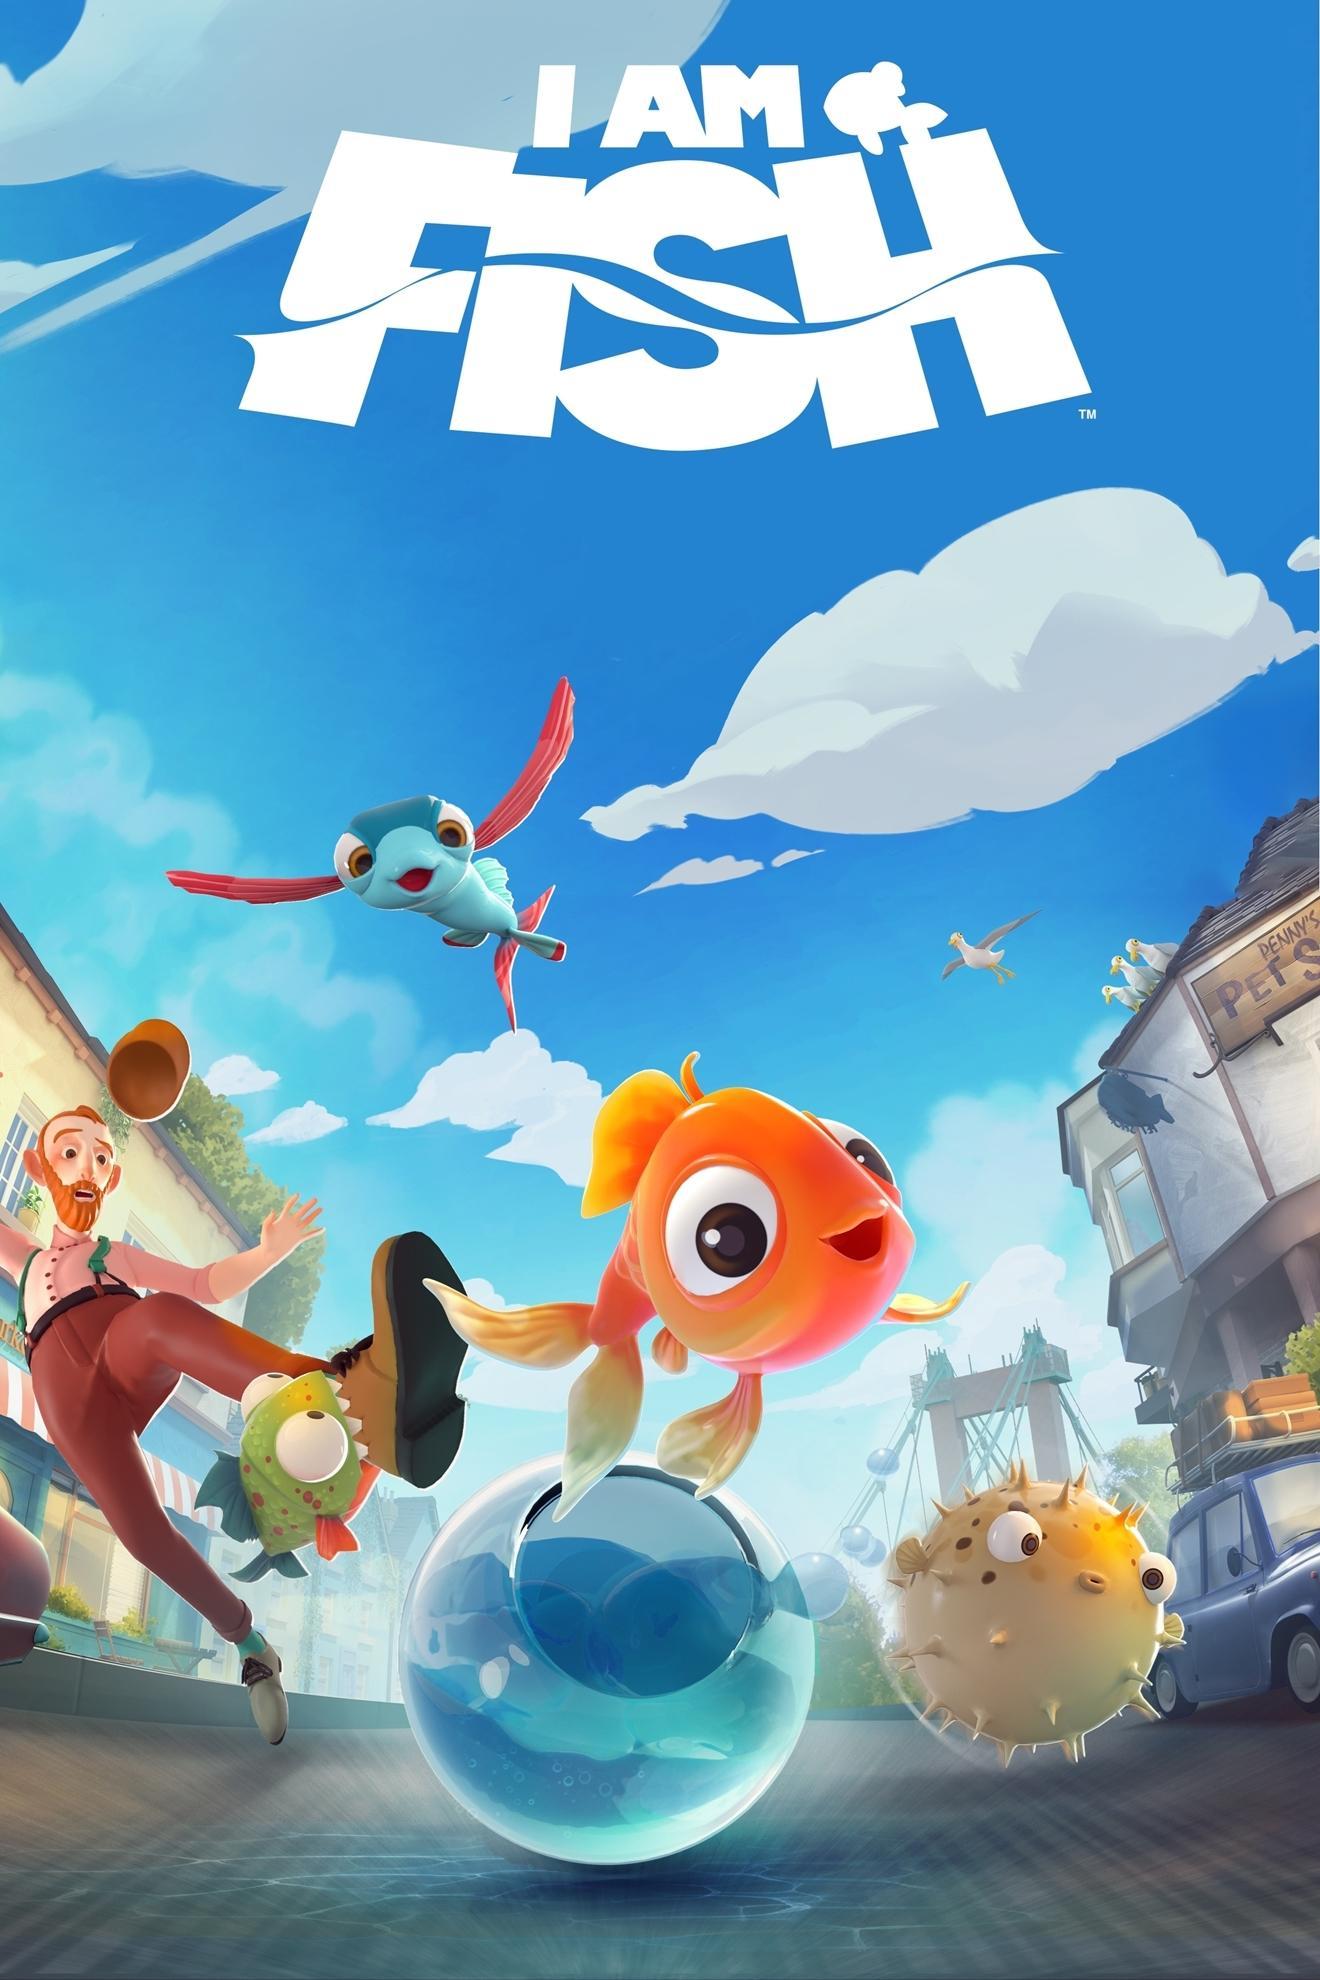 I Am Fish - Launch | LATAM (166173c8-3fdd-400d-9eed-db799d91675b)